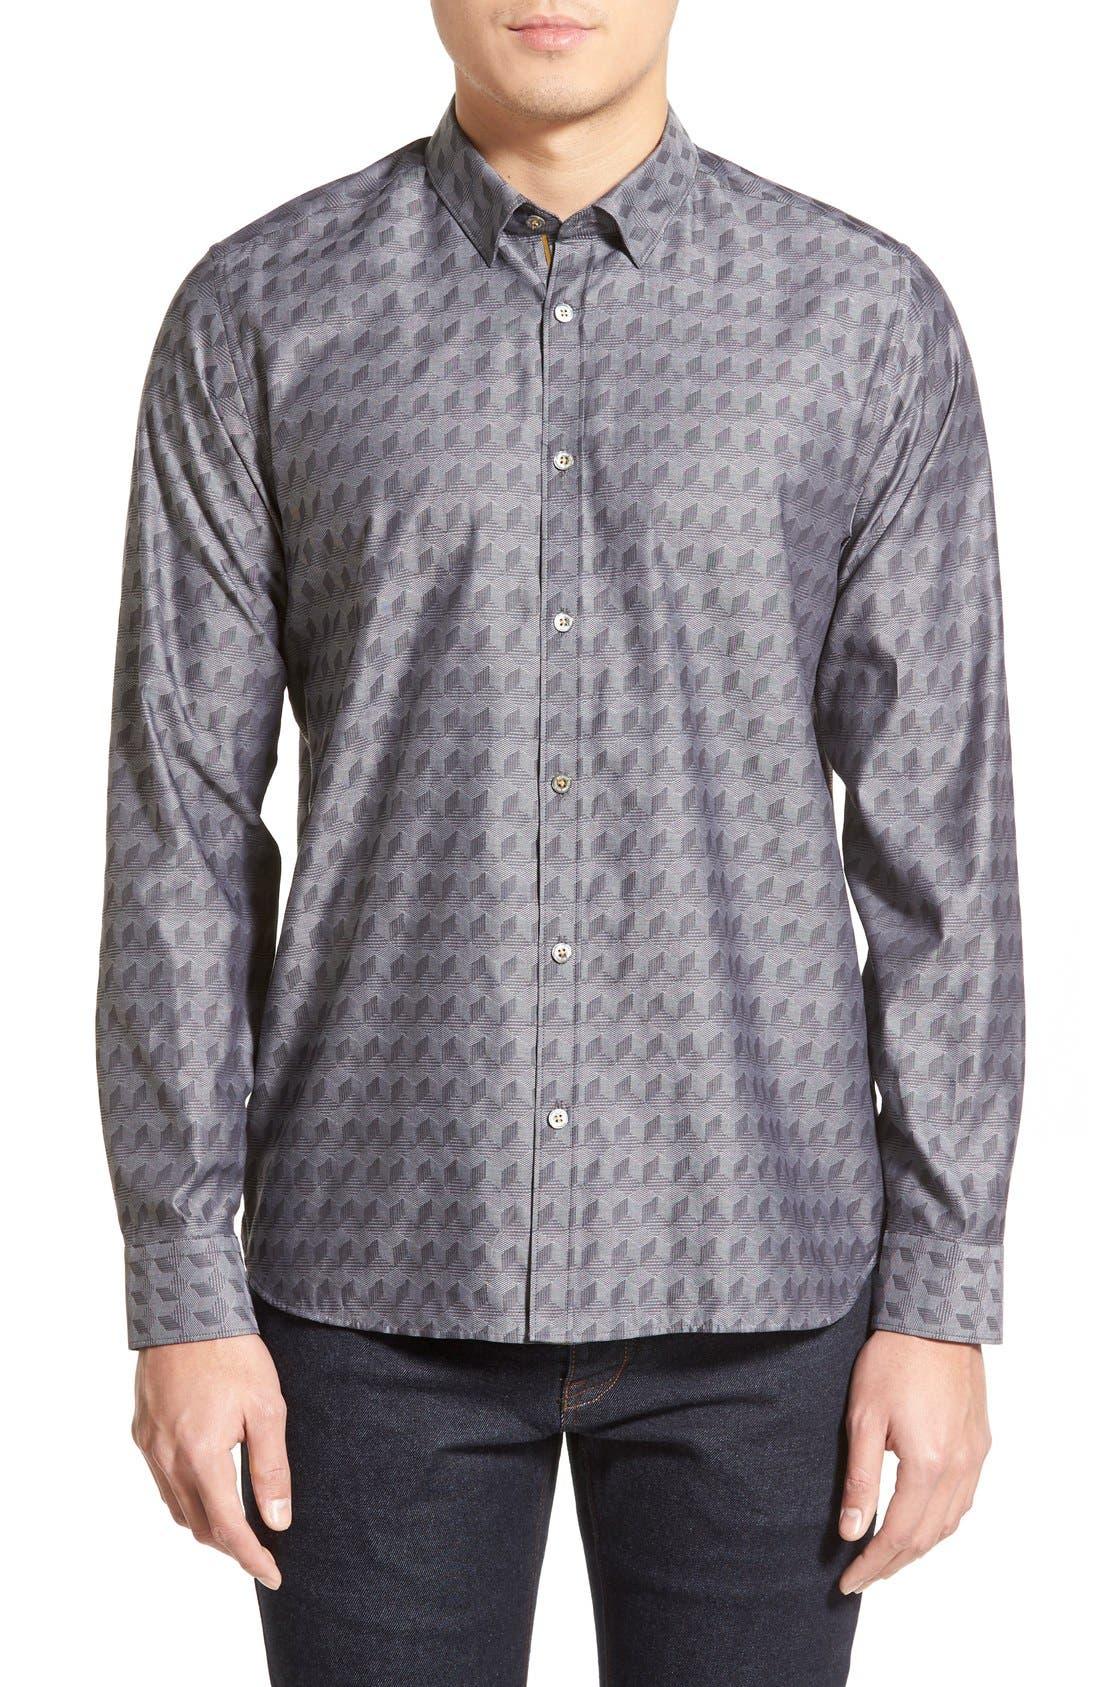 'Chaymo' Modern Slim Fit Geometric Chambray Sport Shirt,                             Main thumbnail 1, color,                             001